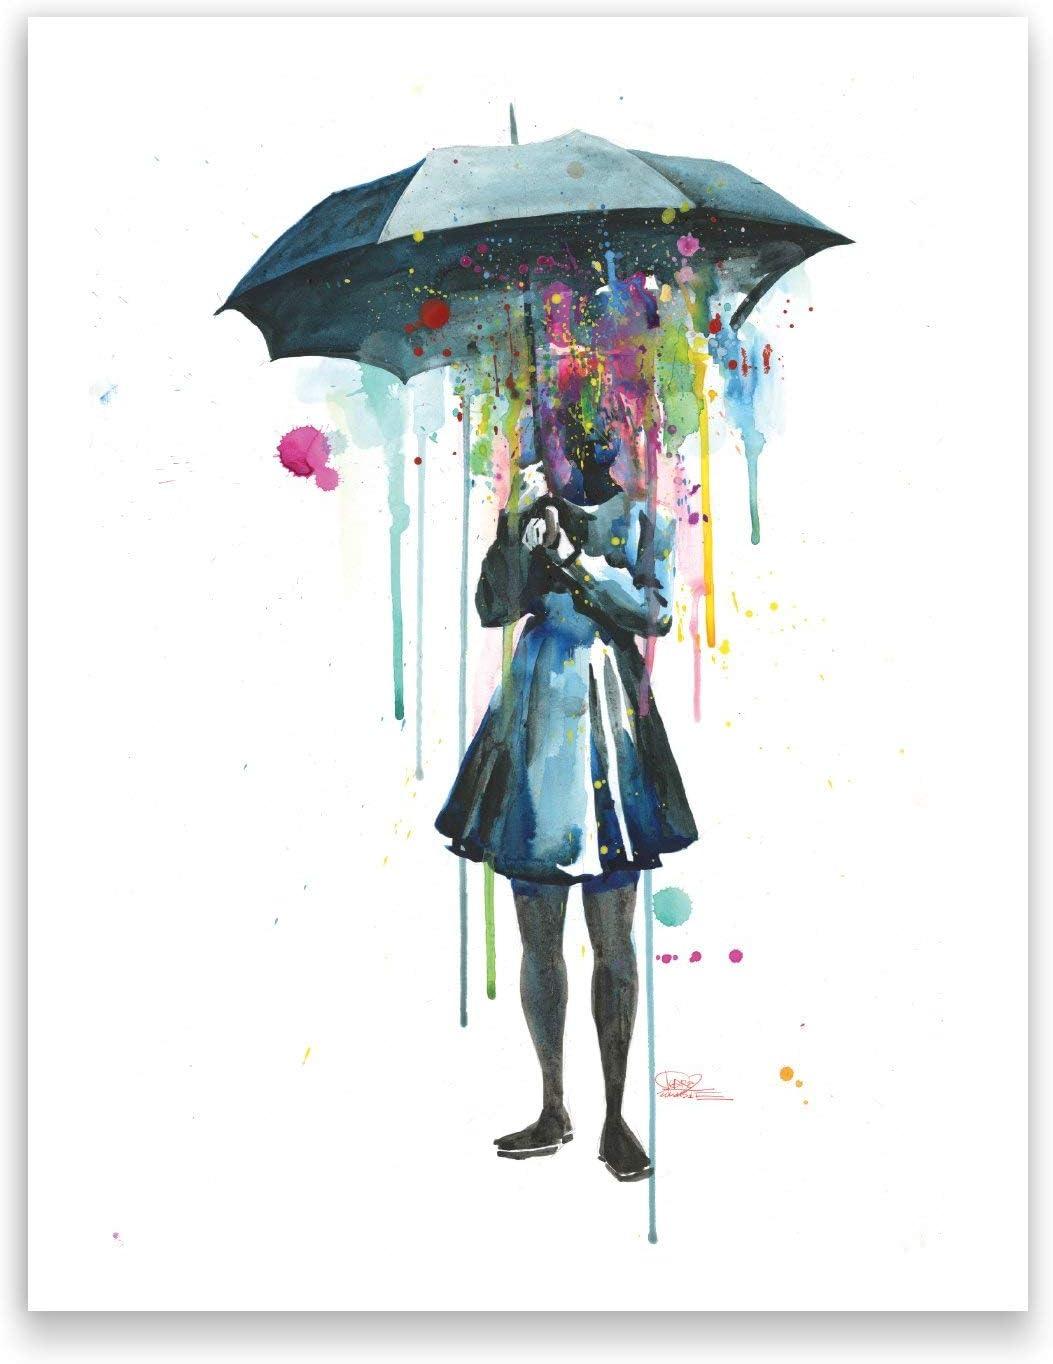 Lora Zombie Studio Art Print - 16